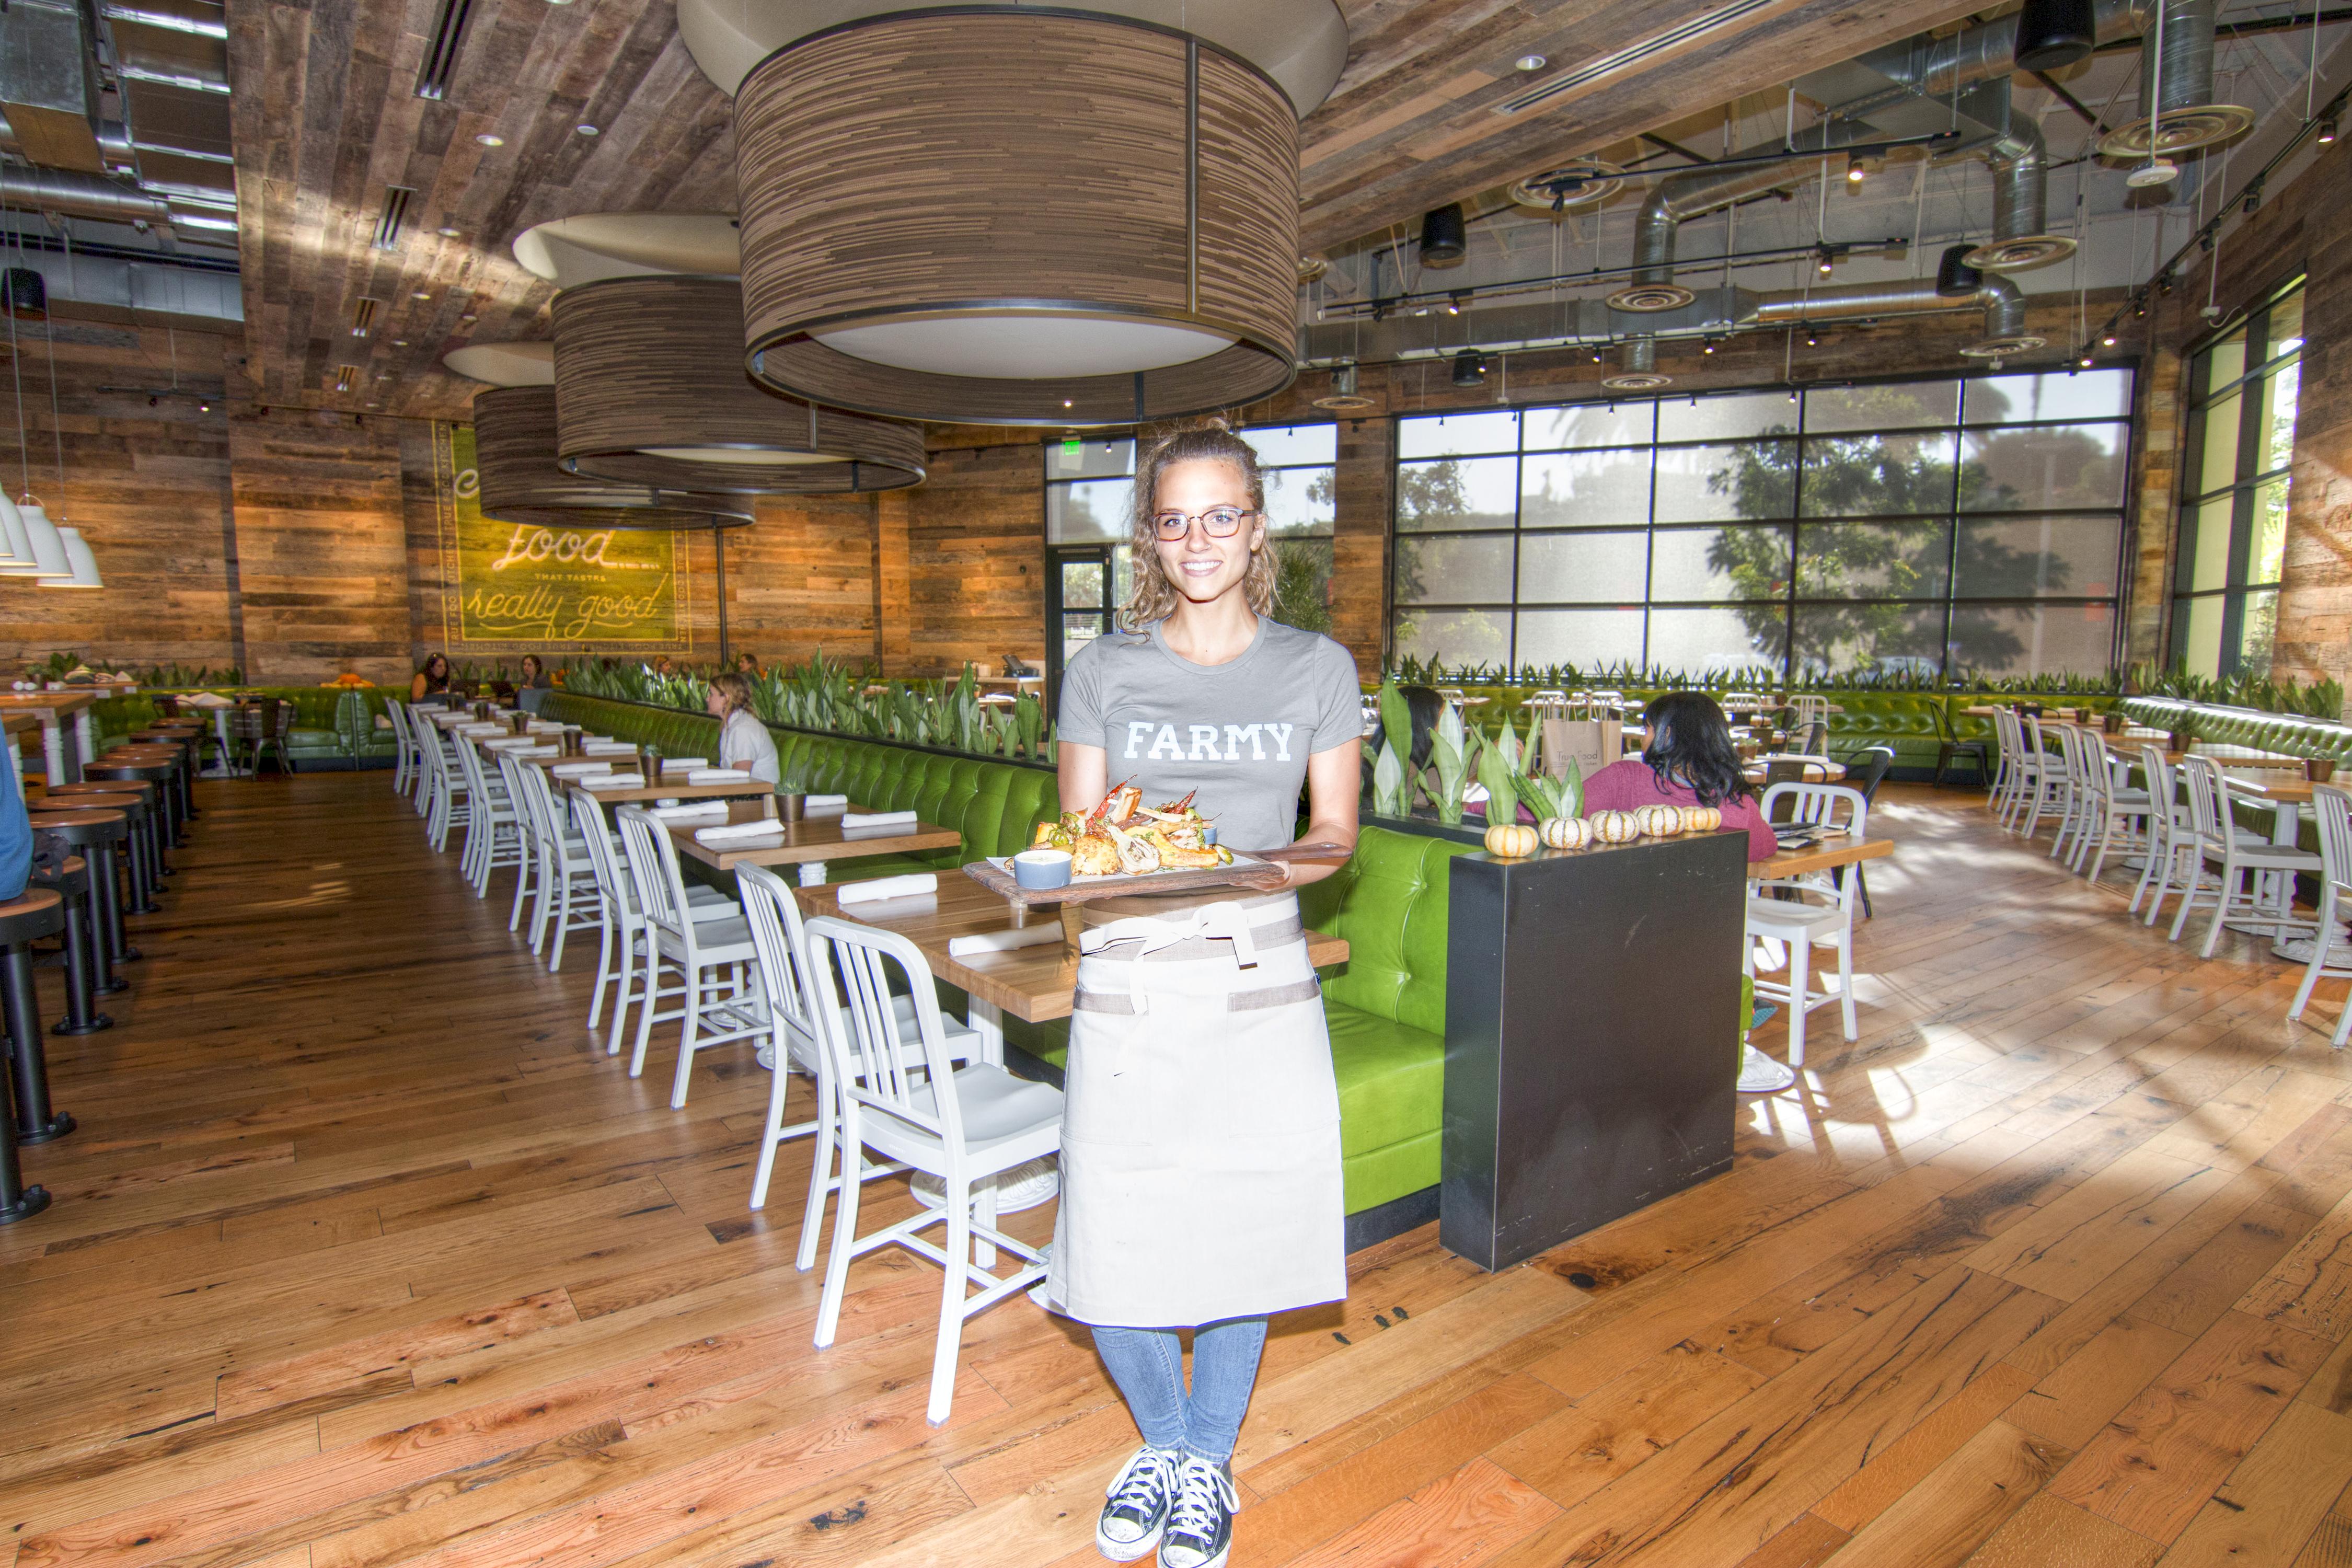 True Food Kitchen's Julia Cox serves the roasted seasonal vegetable board. Photo by Brad Jacobson